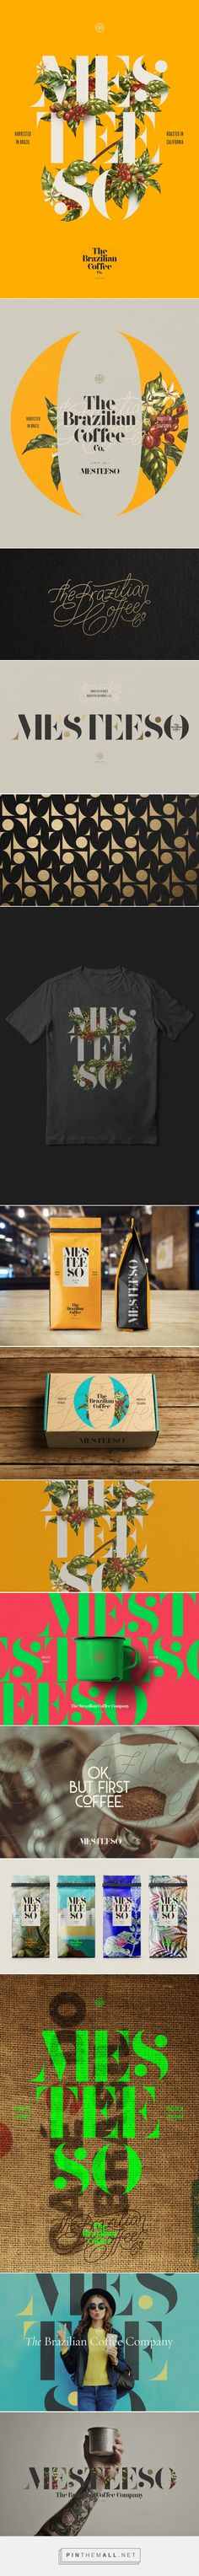 The Brazilian Coffee Co.   Mesteeso on Behance - created via https://pinthemall.net